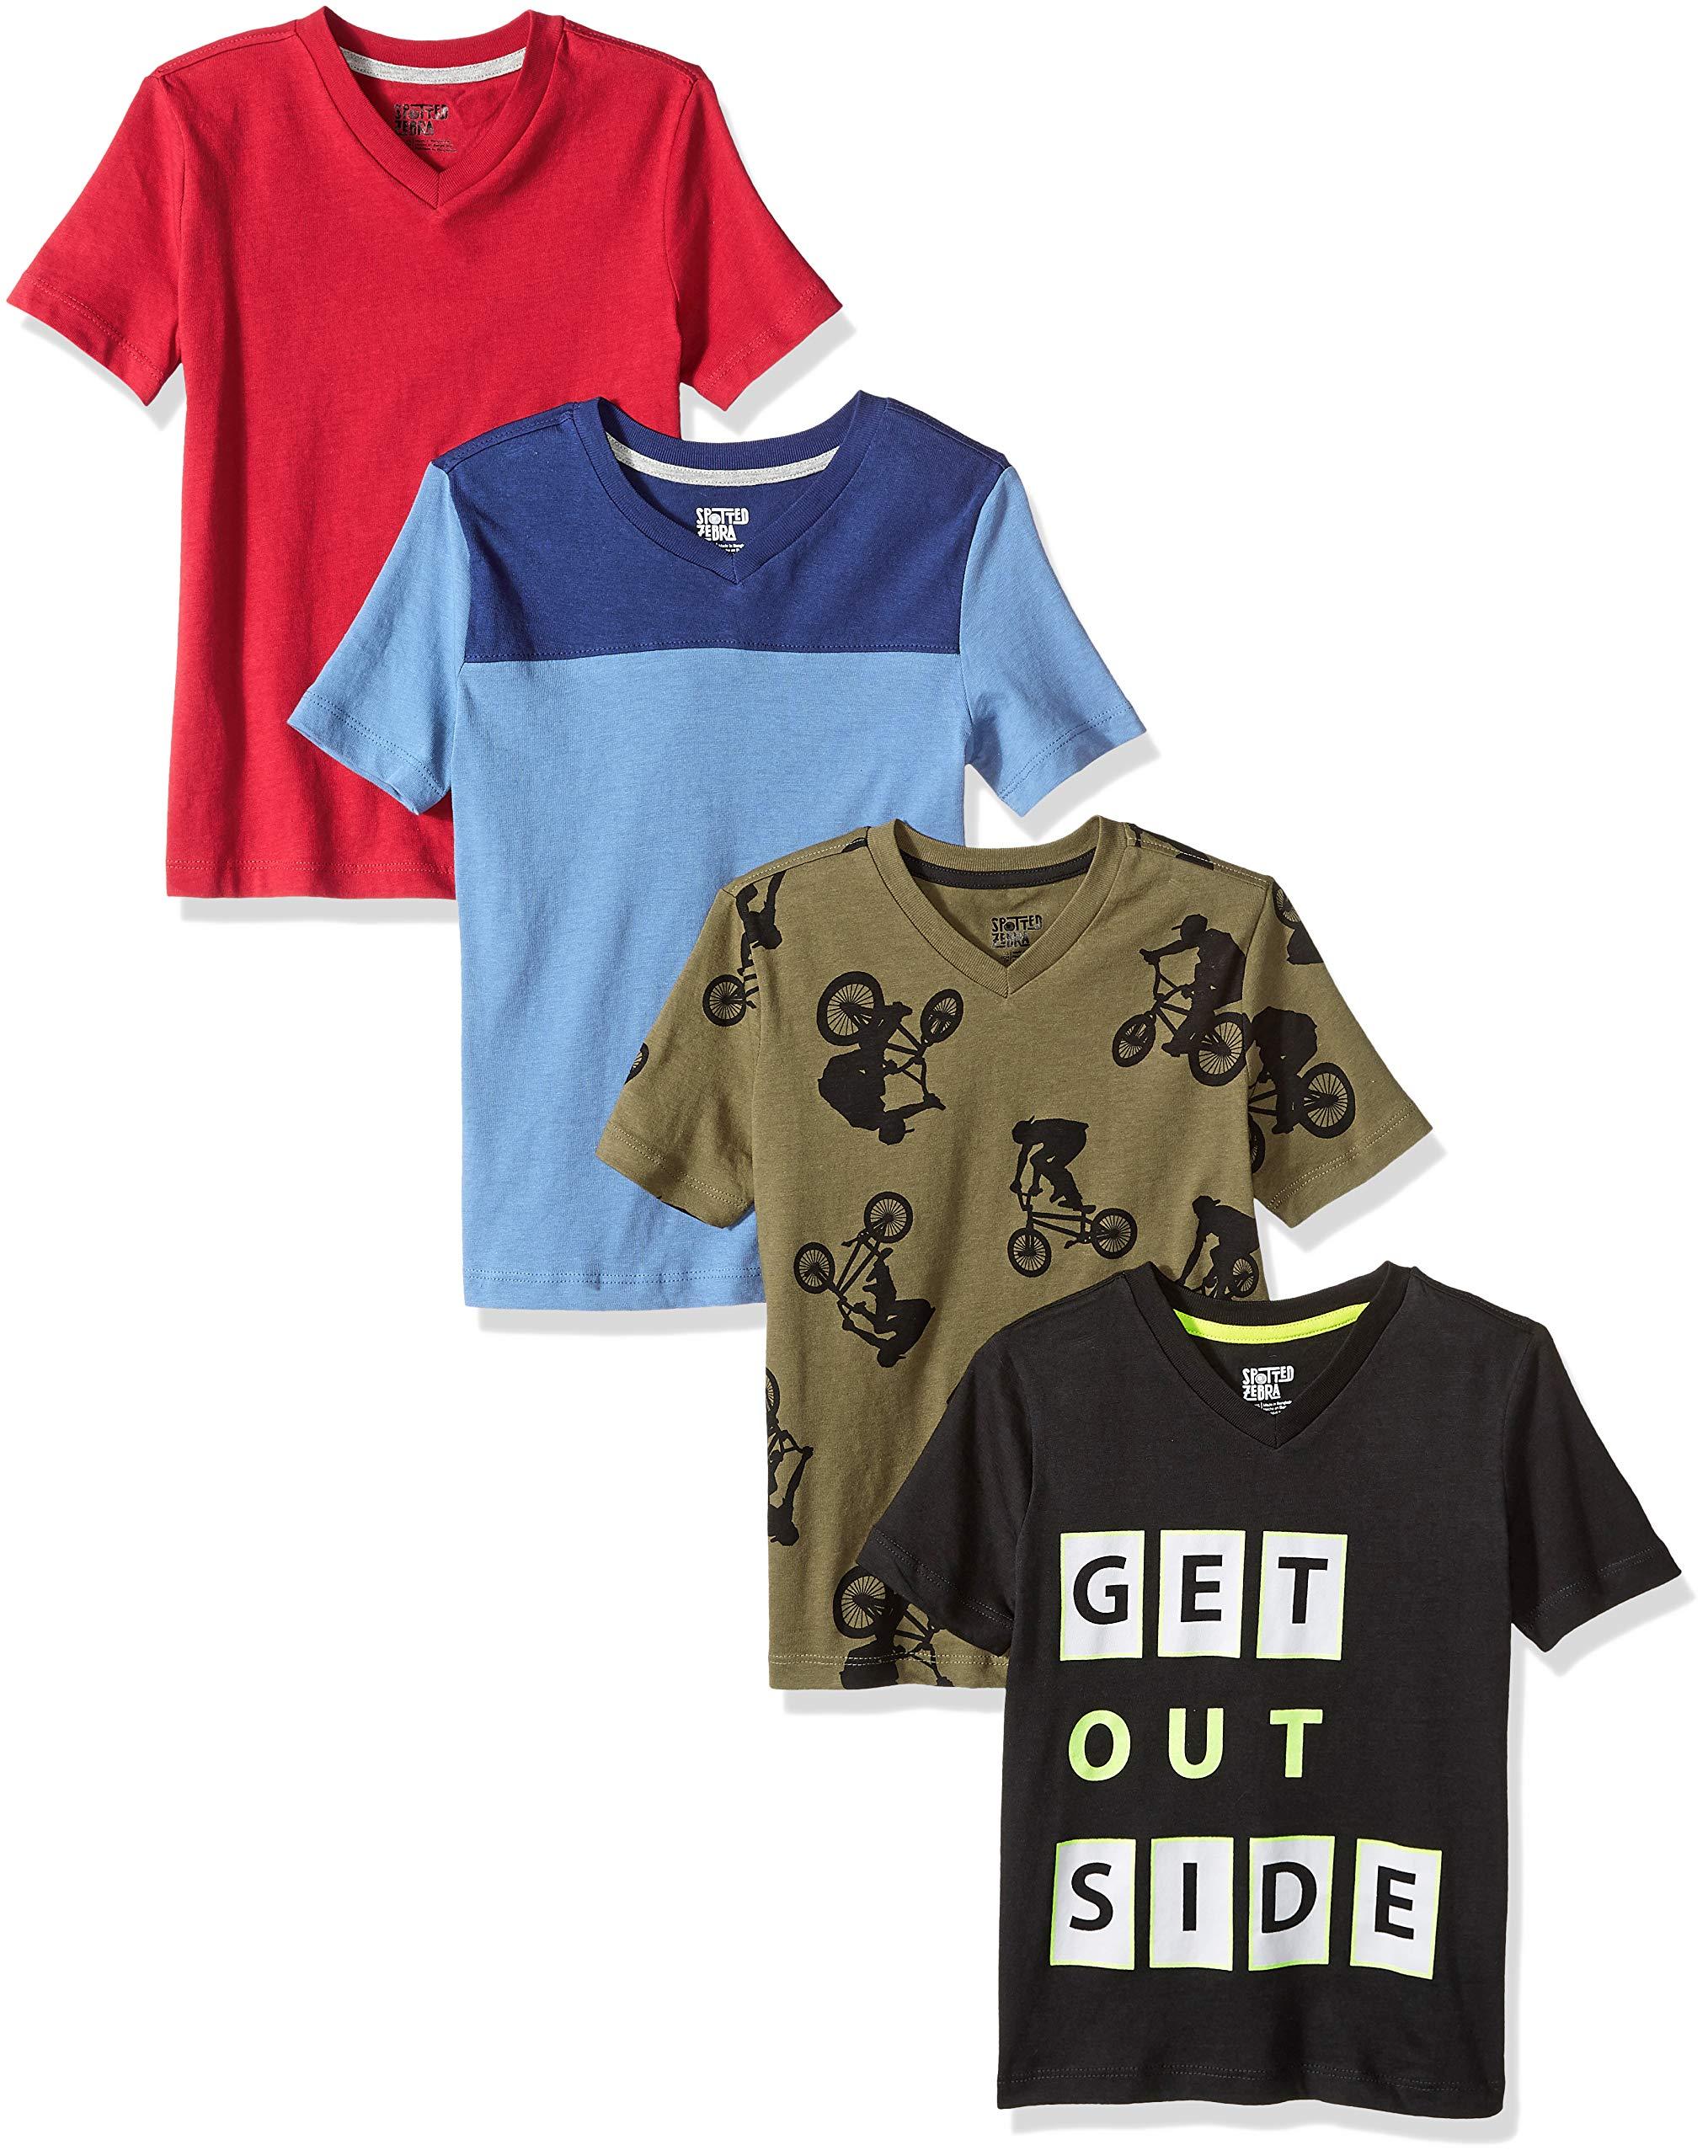 Amazon Brand - Spotted Zebra Boys' Little Kid 4-Pack Short-Sleeve V-Neck T-Shirts, Go Outside, Small (6-7) by Spotted Zebra